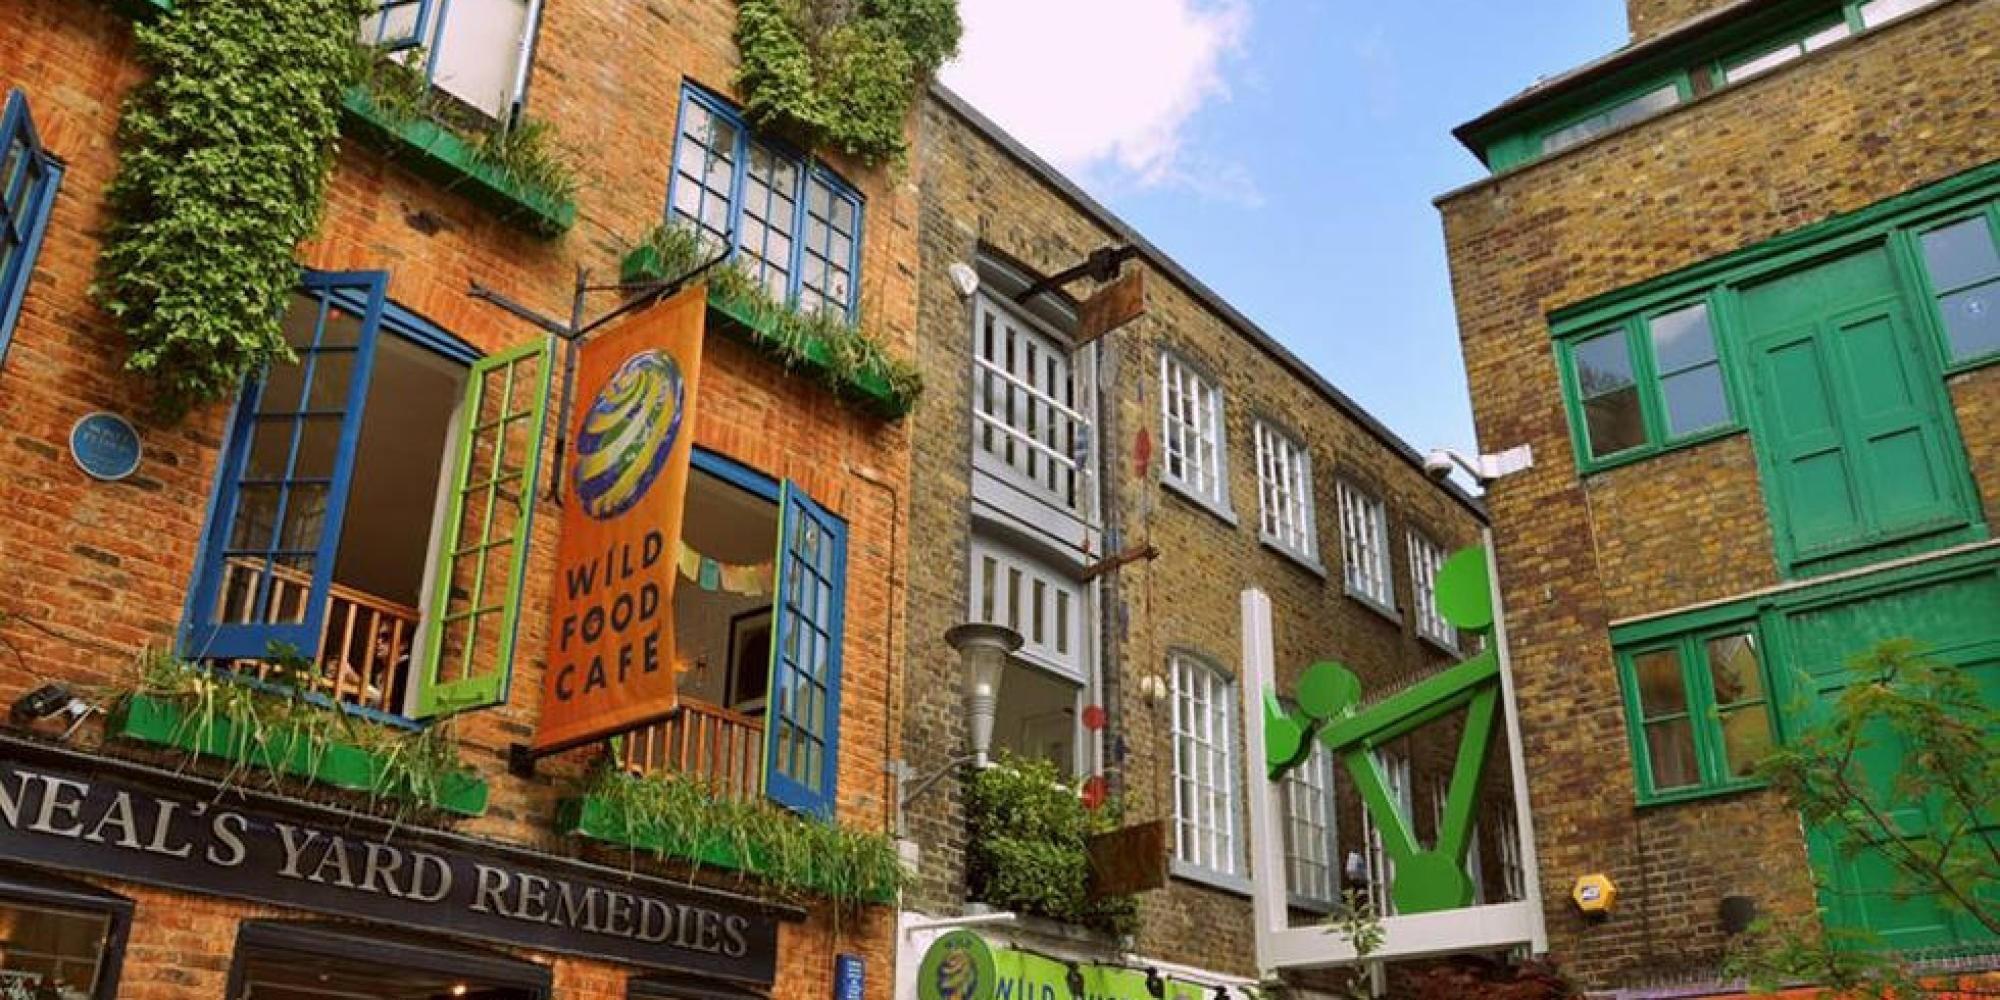 Ocho rincones secretos de Londres que seguramente no conocías (FOTOS)